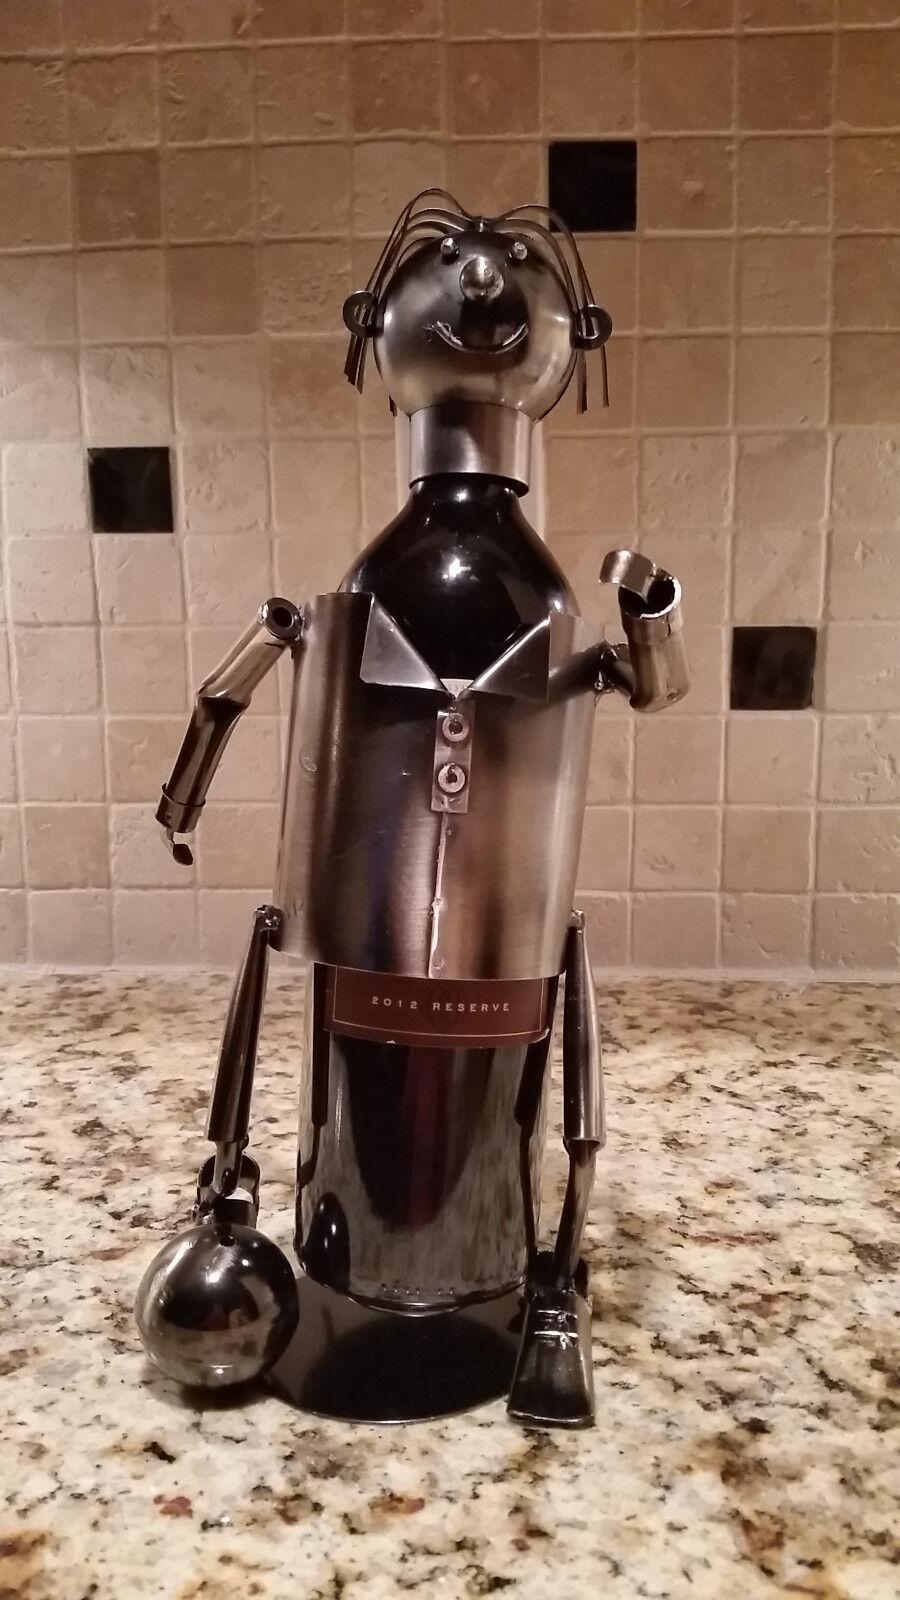 Handmade joueur de foot porte bouteille vin Caddy Metal Sculpture Collectible